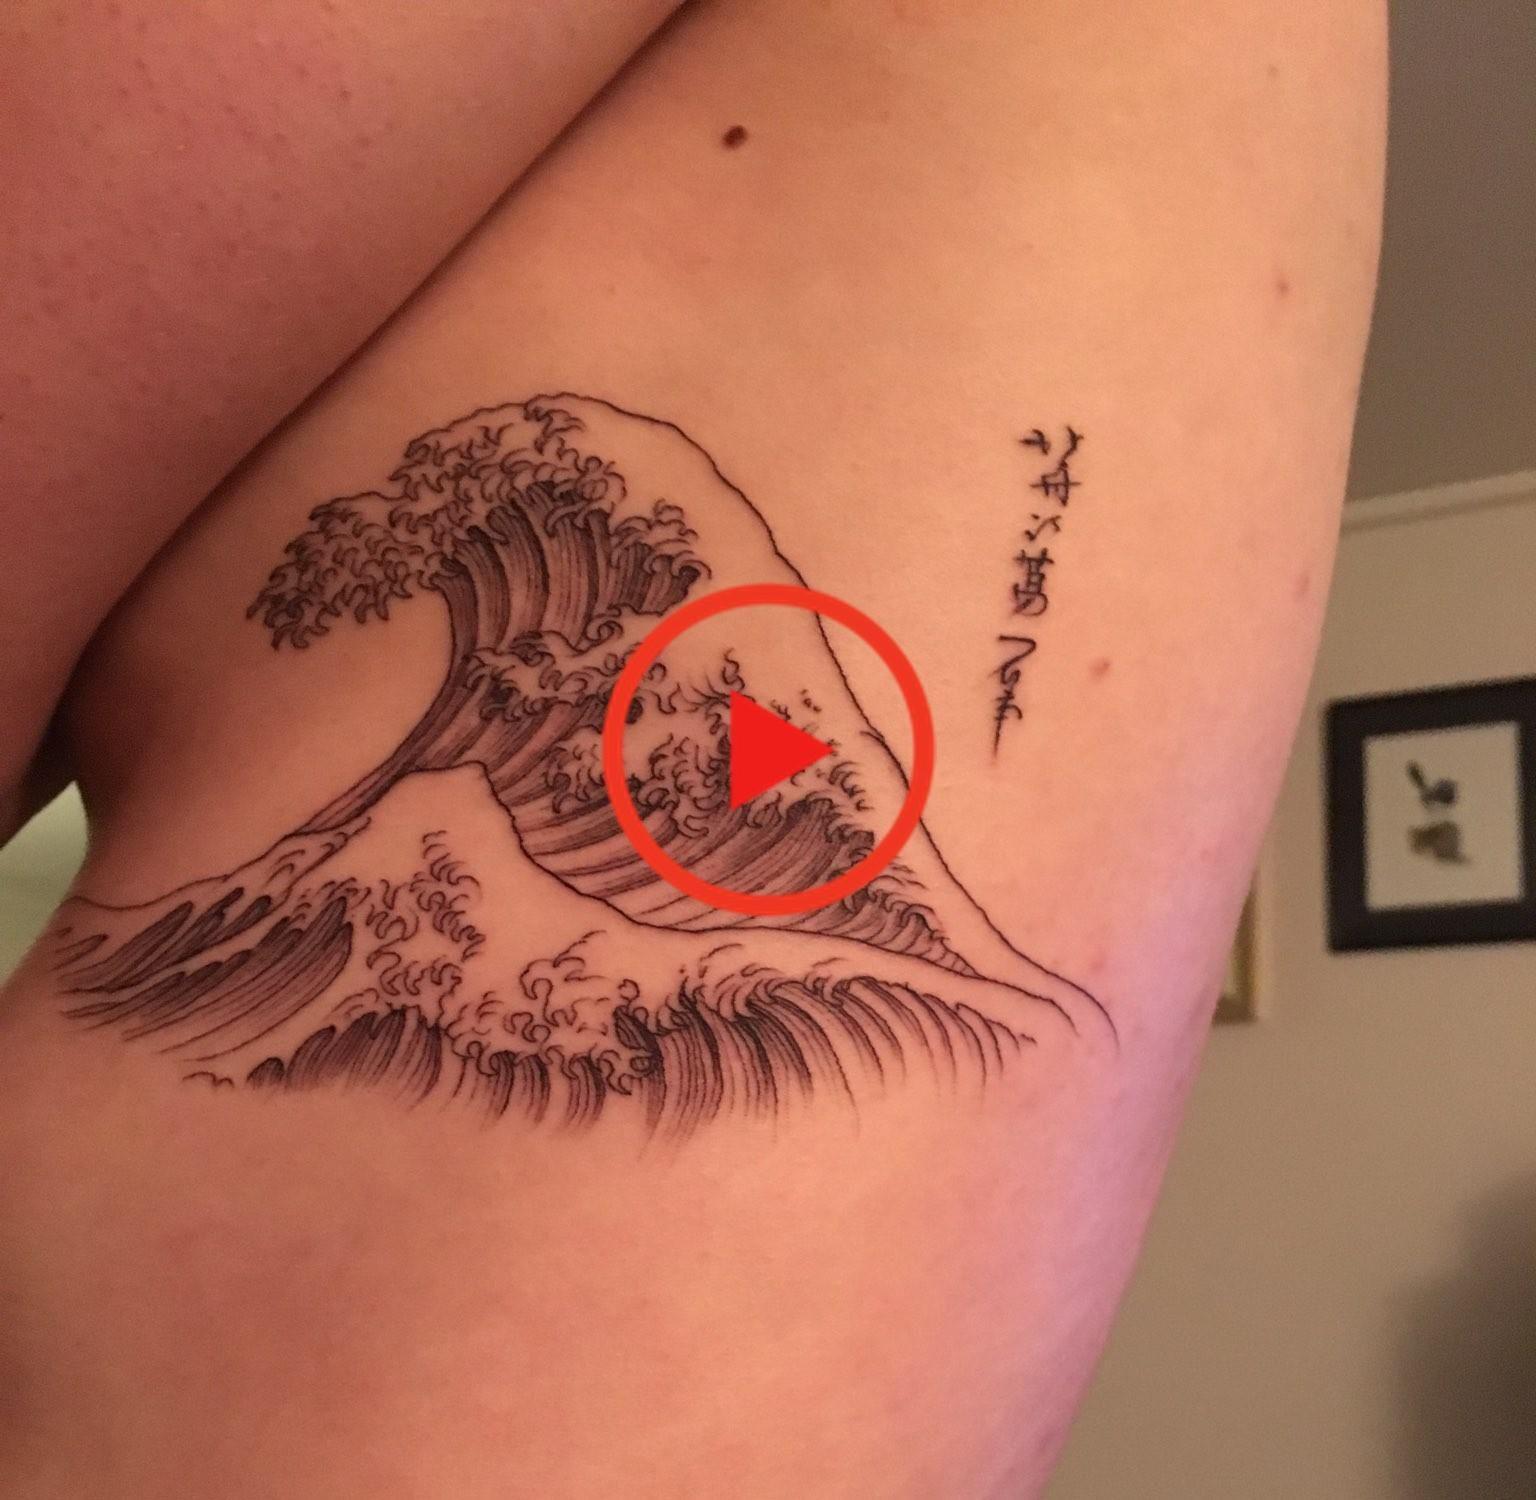 The Great Wave Of Kanagawa Tattoo By J At Hidden Moon Tattoo Melbourne Bestsleevetattoos Tatuagem Tatuagens Japonesas